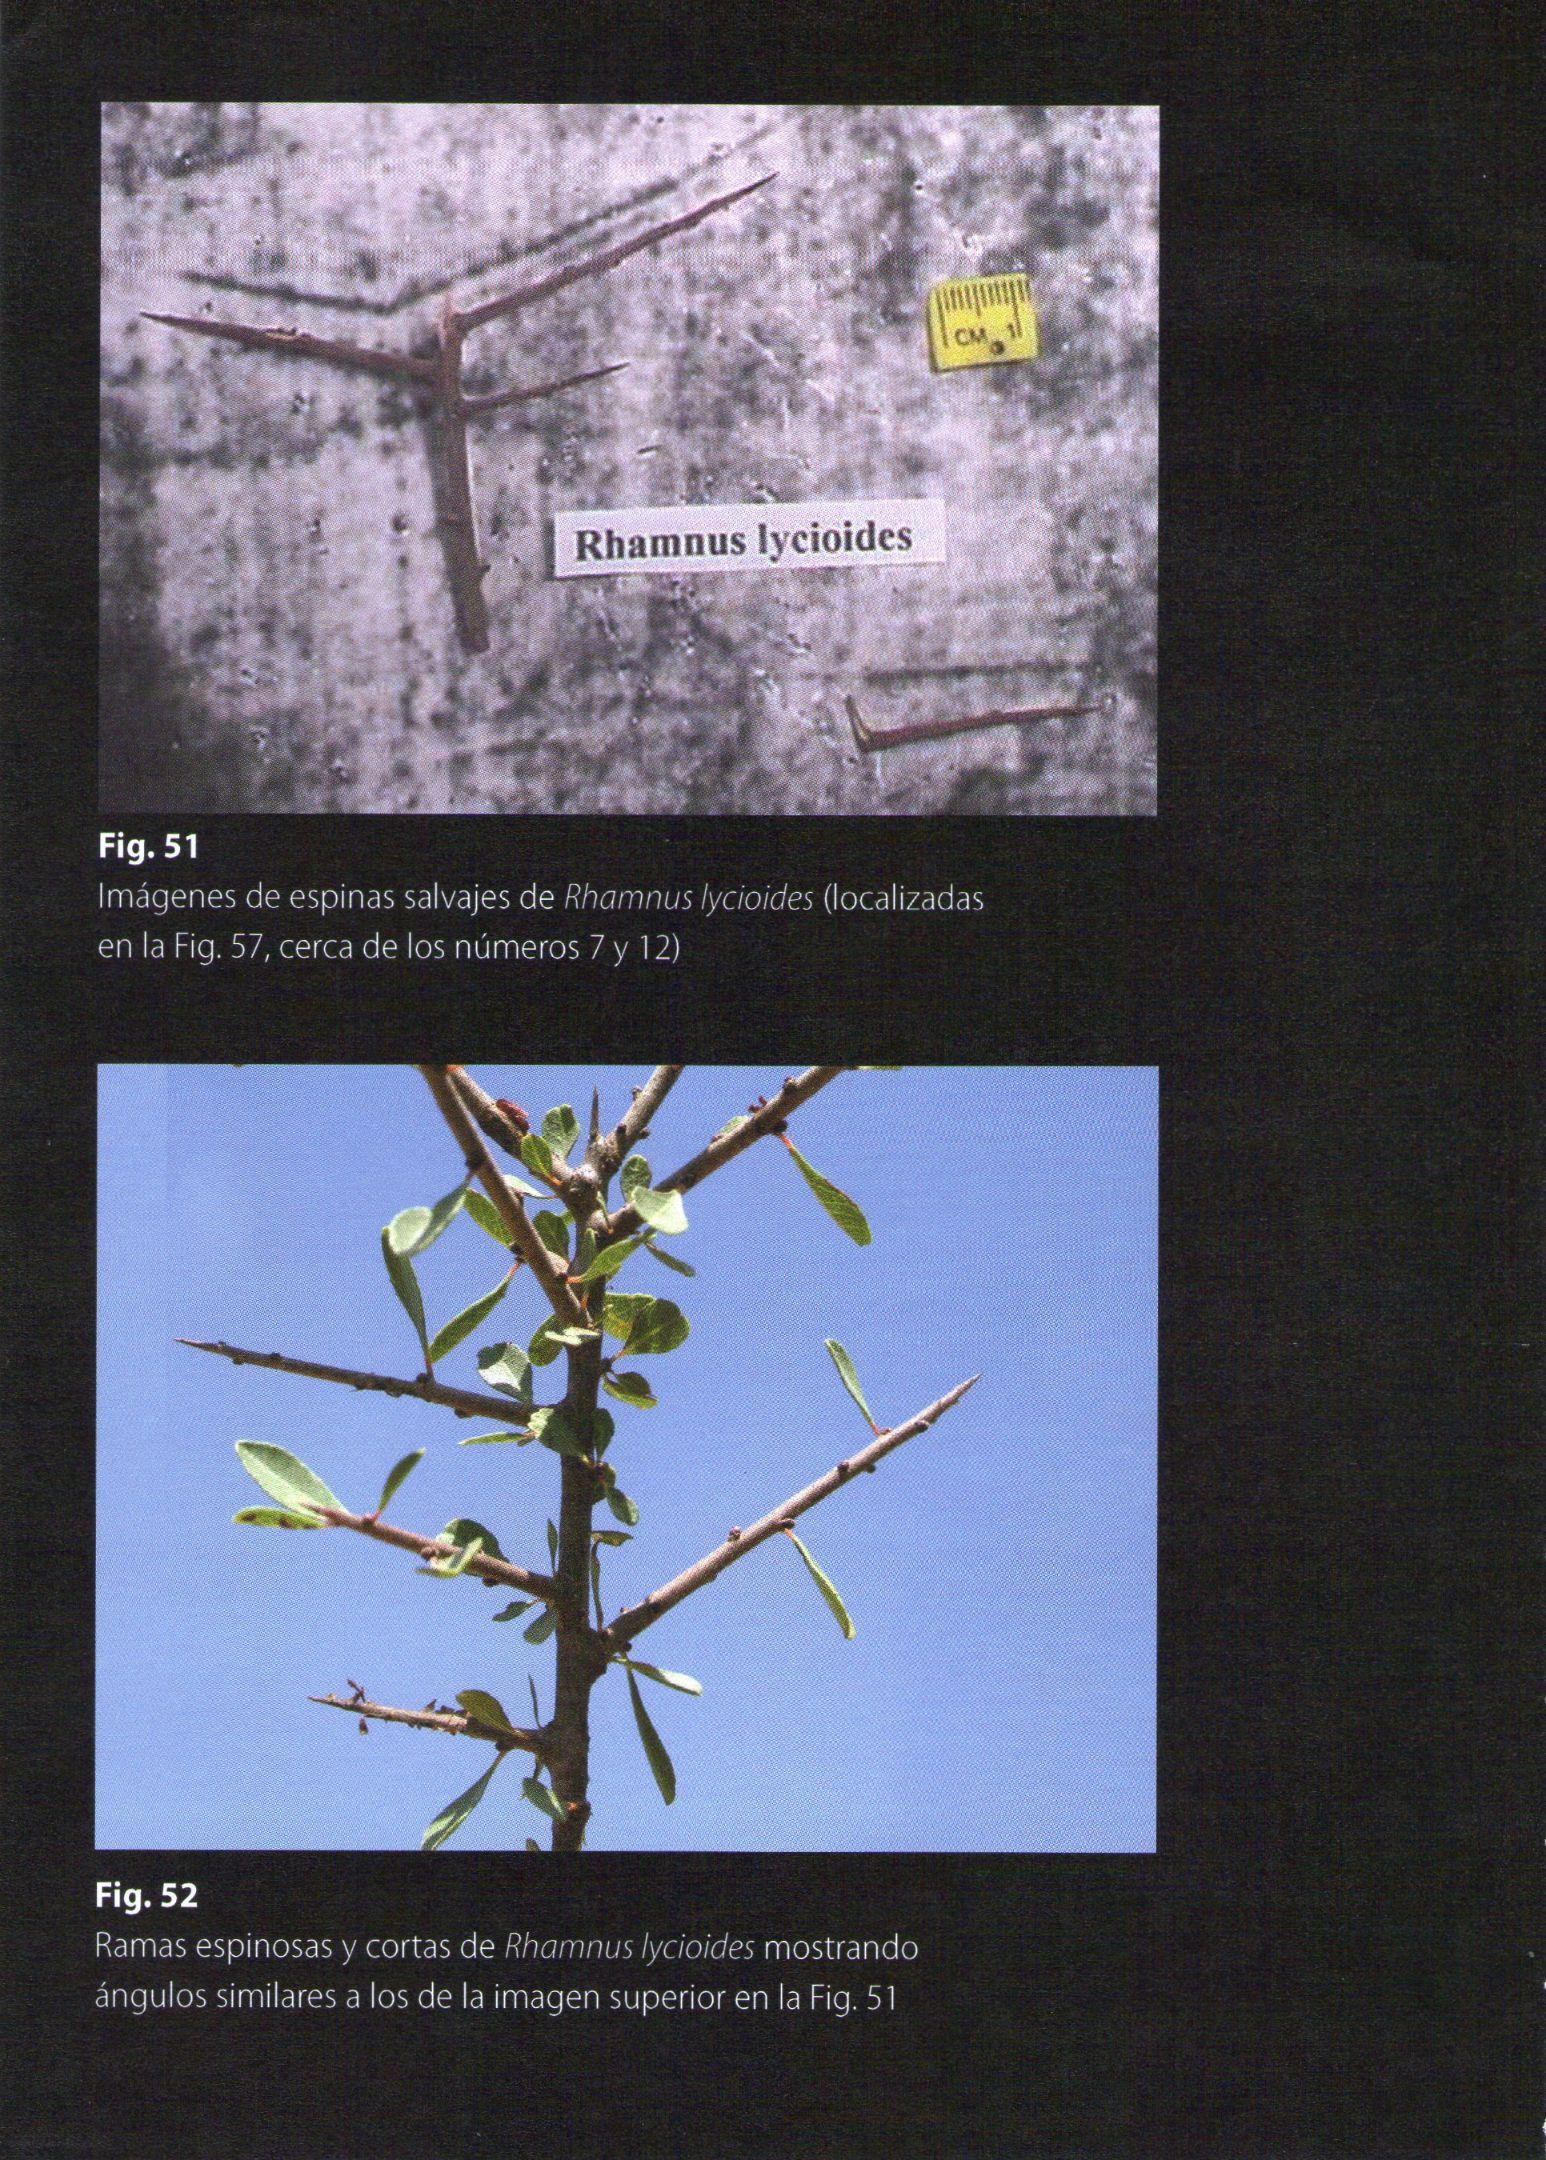 Photo 9. RHAMNUS LYCIOIDES thorns